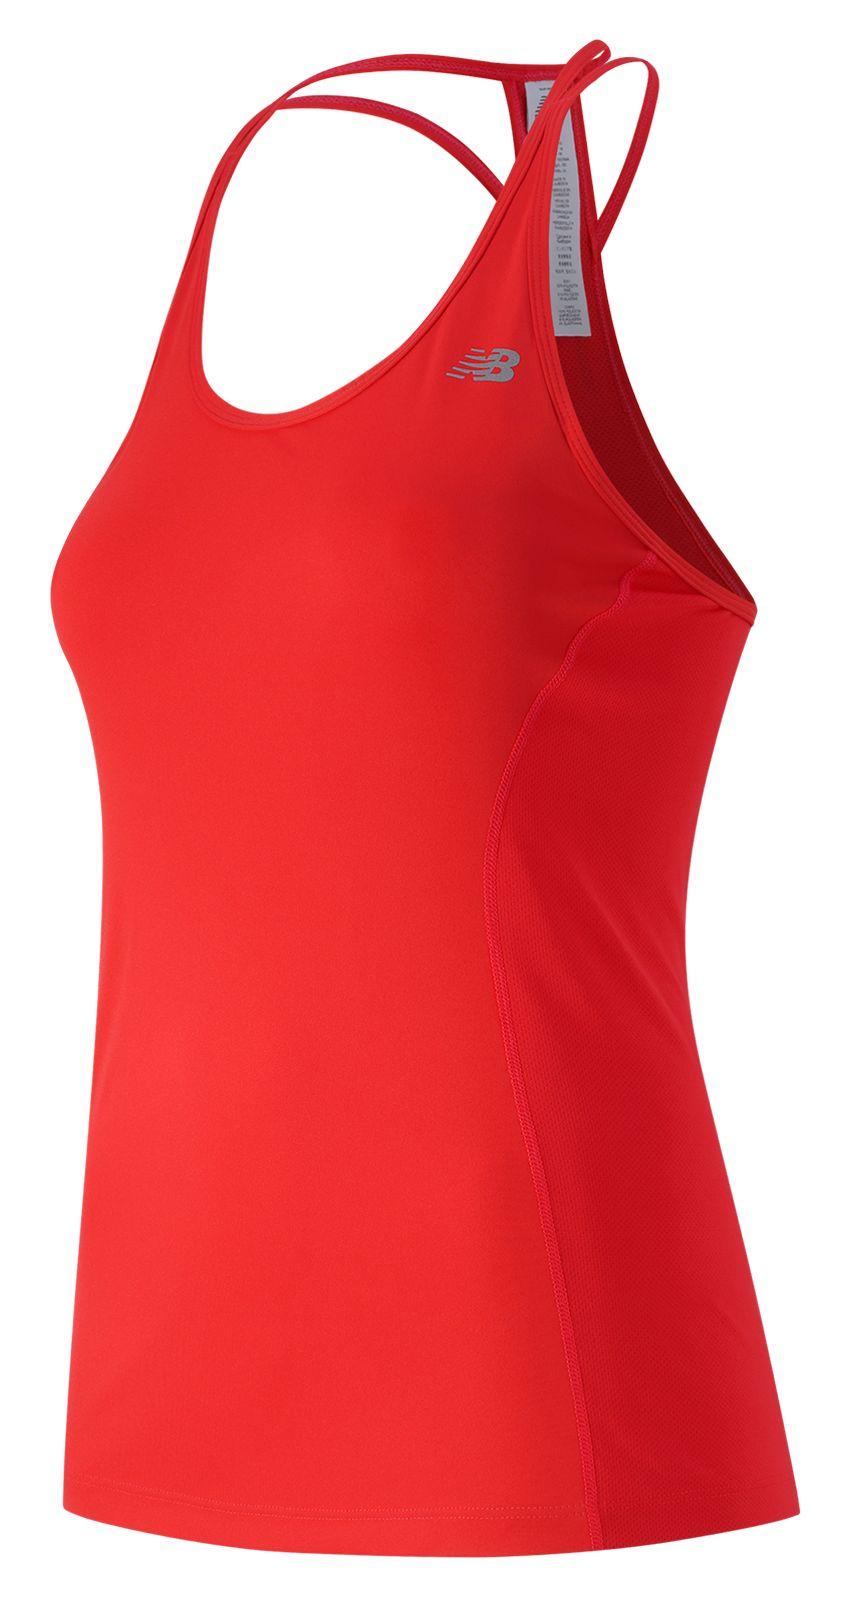 New Balance 53225 Women's NB Ice Tank : WT53225CE